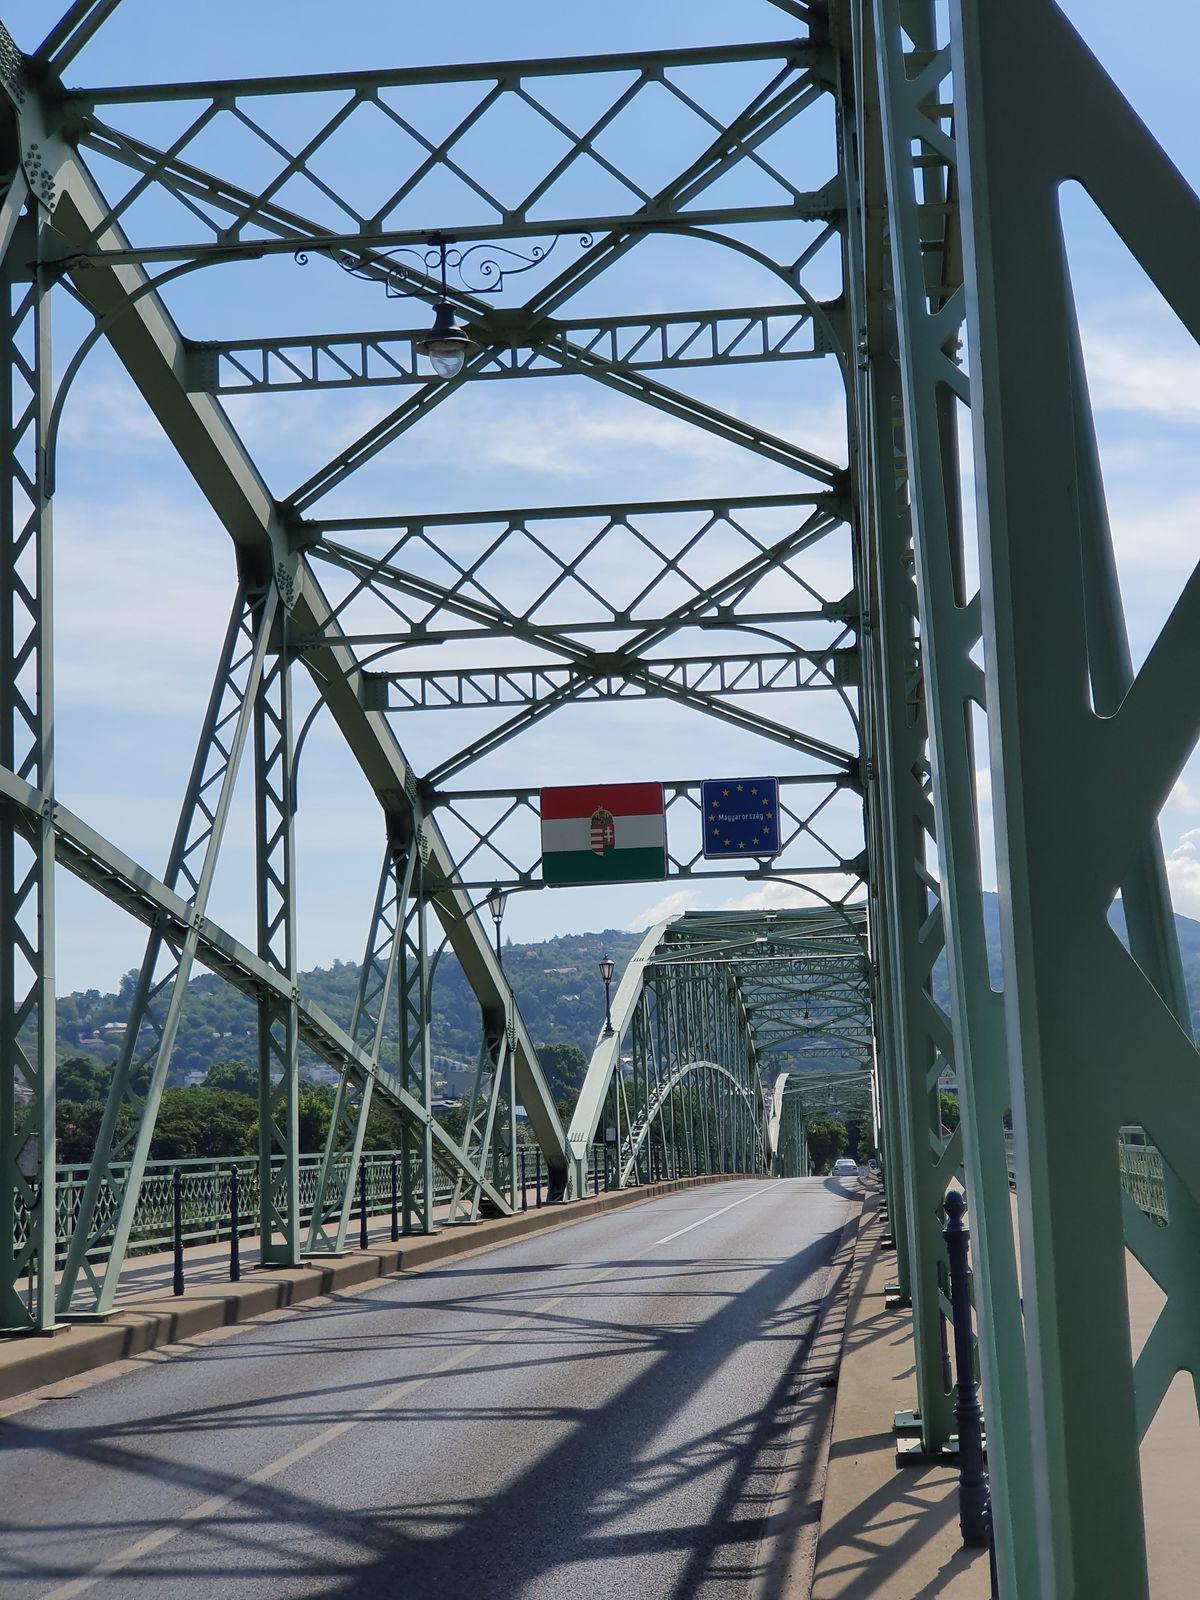 Grenze Slowakei Ungarn bei Esztergom